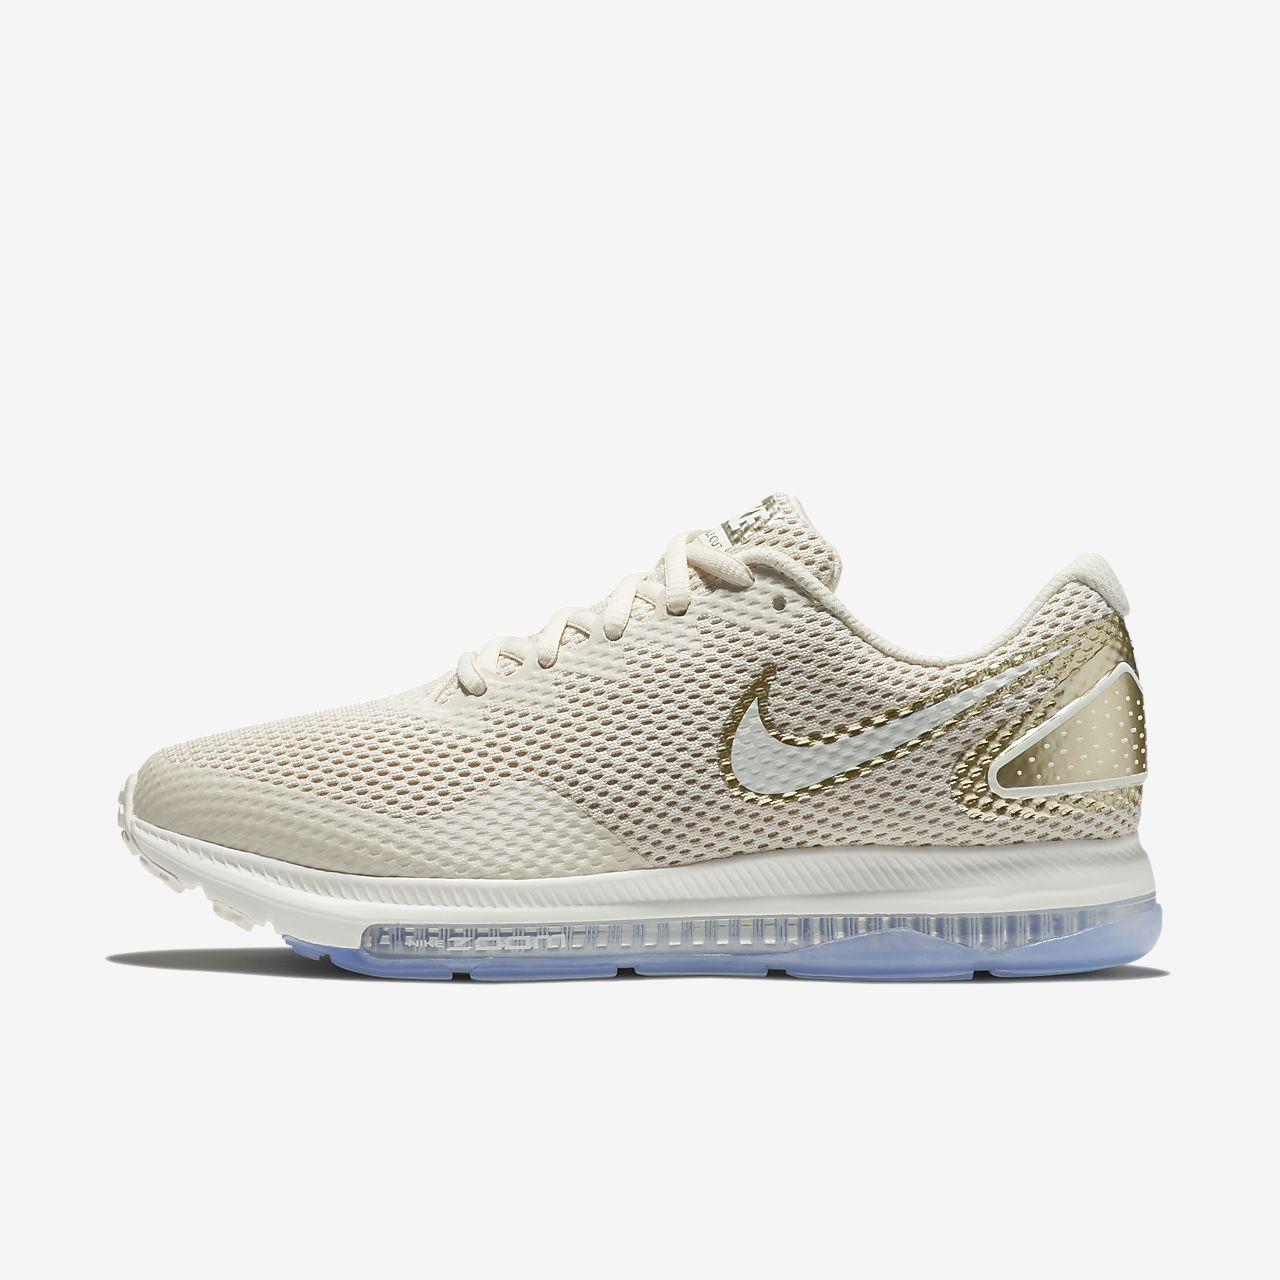 Womens Nike Zoom All Out Low 2 Light Cream/Sail/Metallic Gold Star AJ0036 202